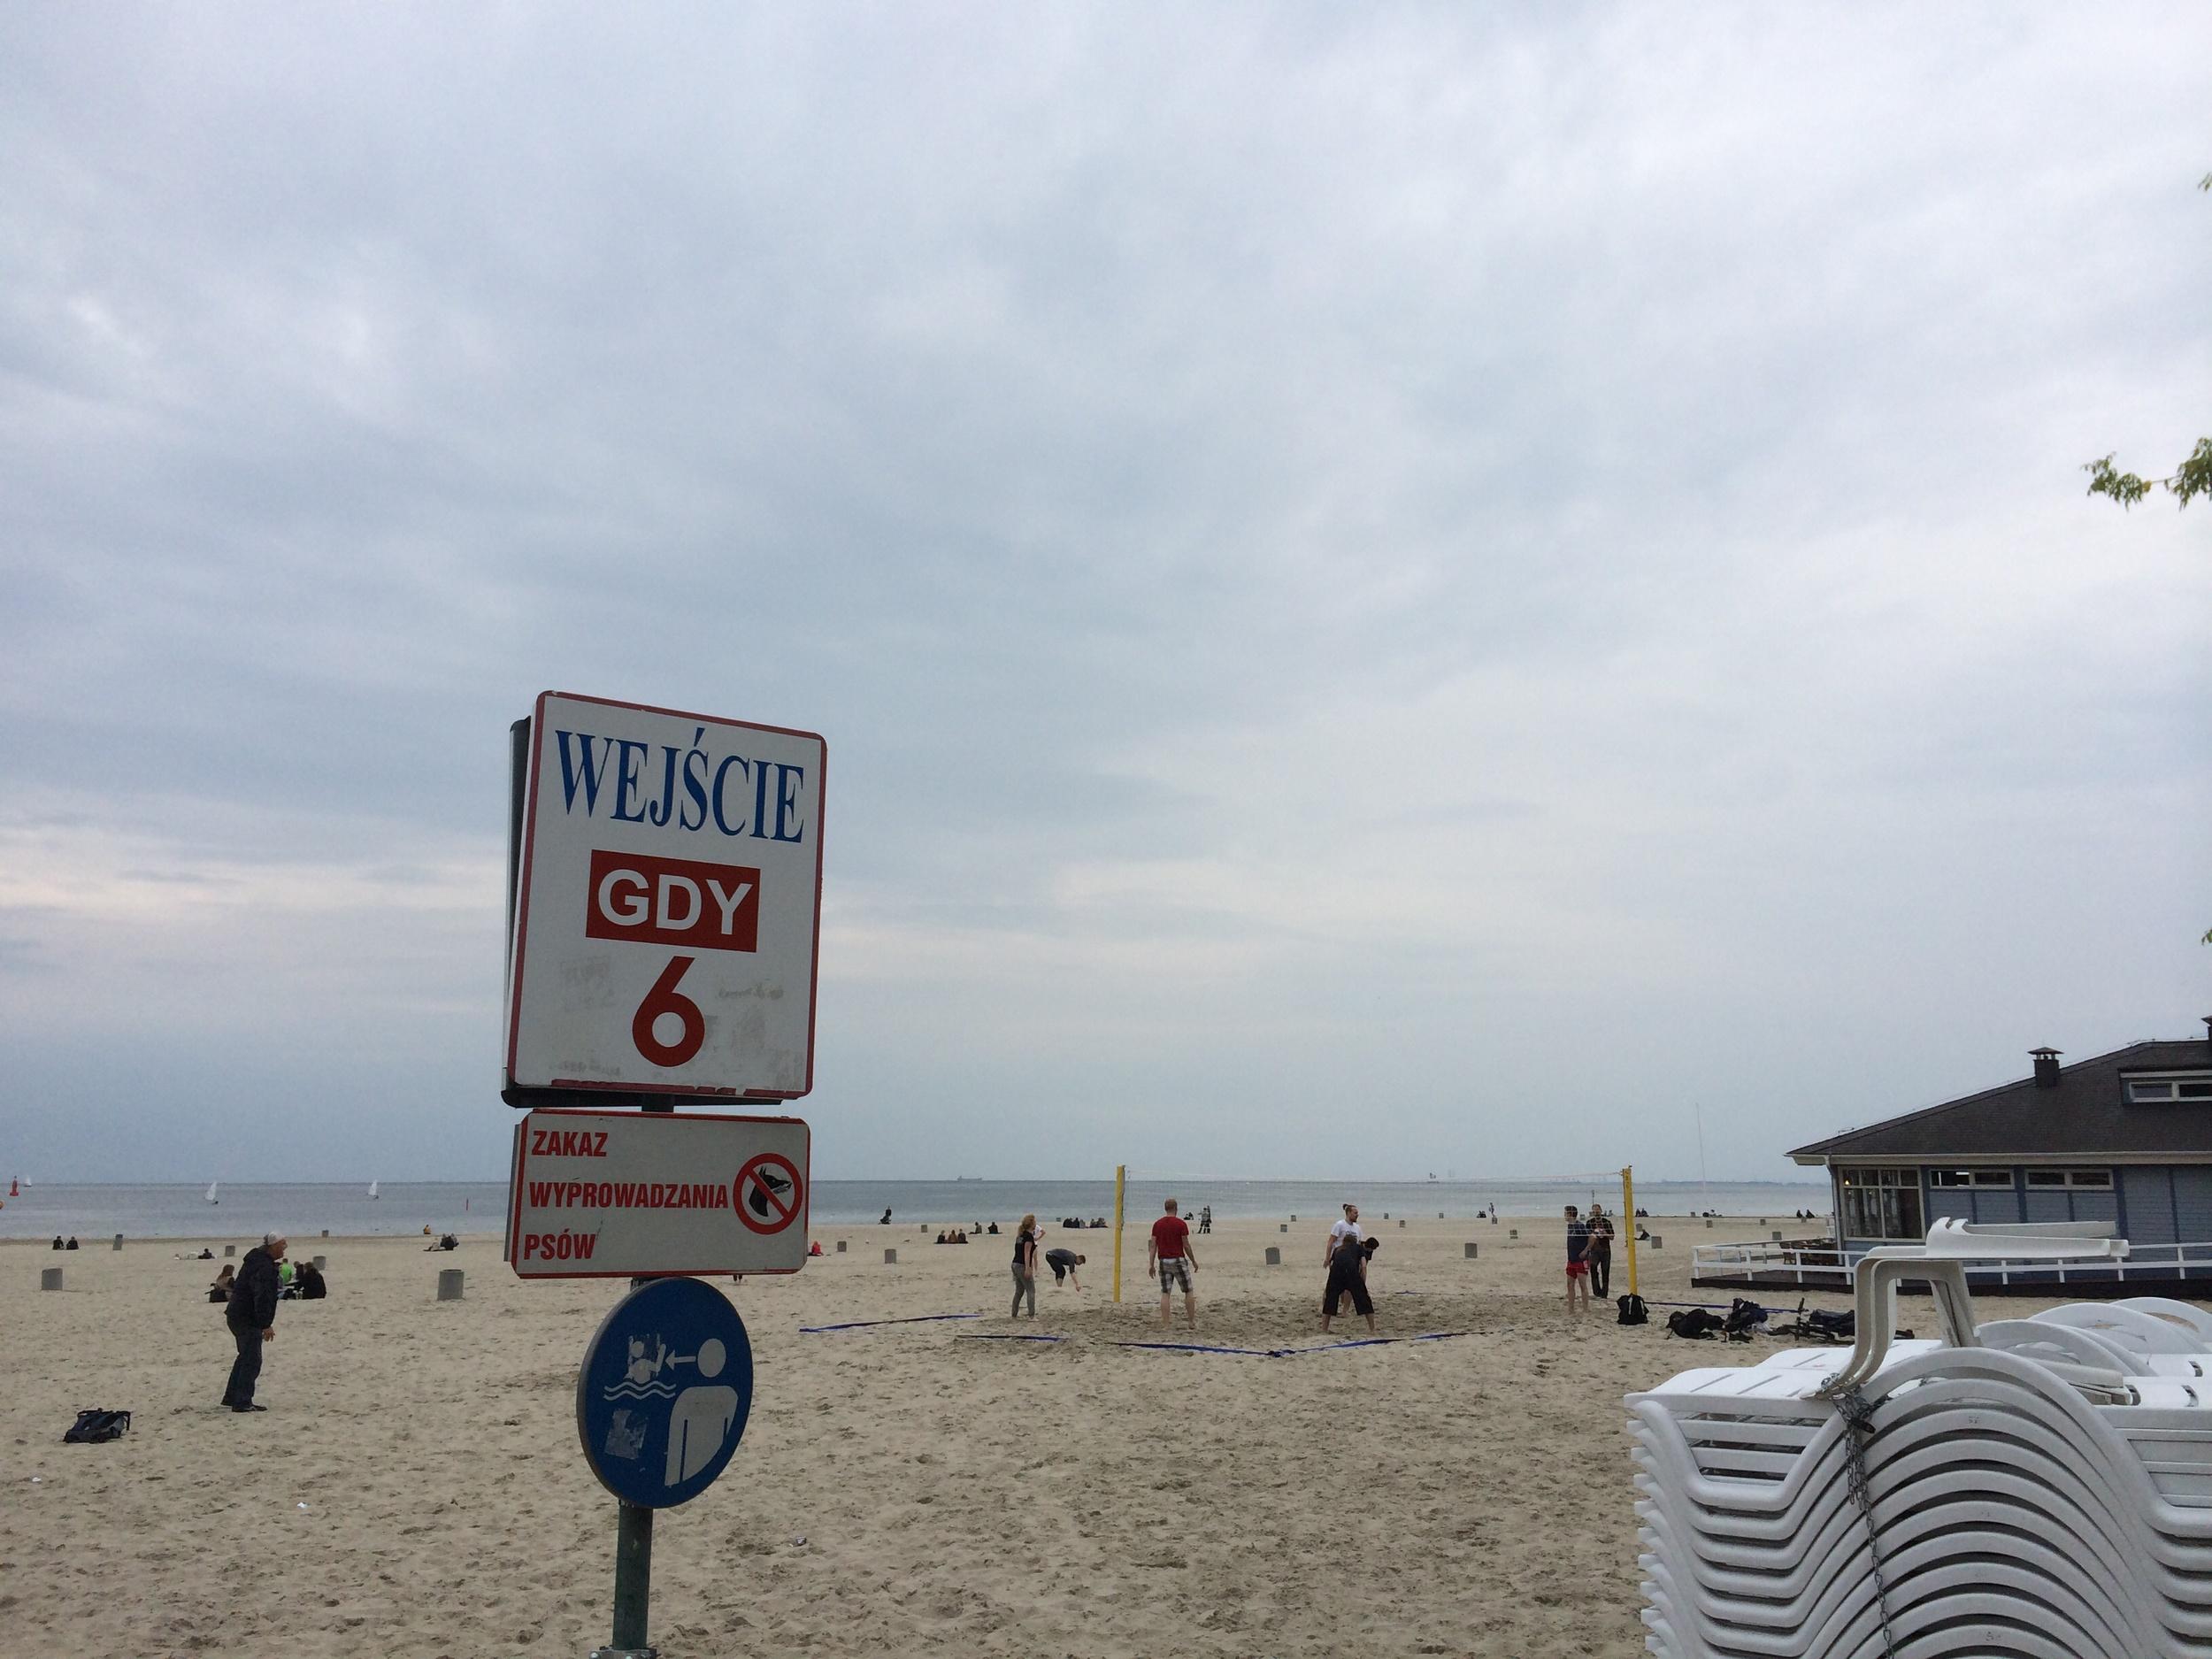 Beach volleyball along the Baltic Sea in Gdynia, Poland